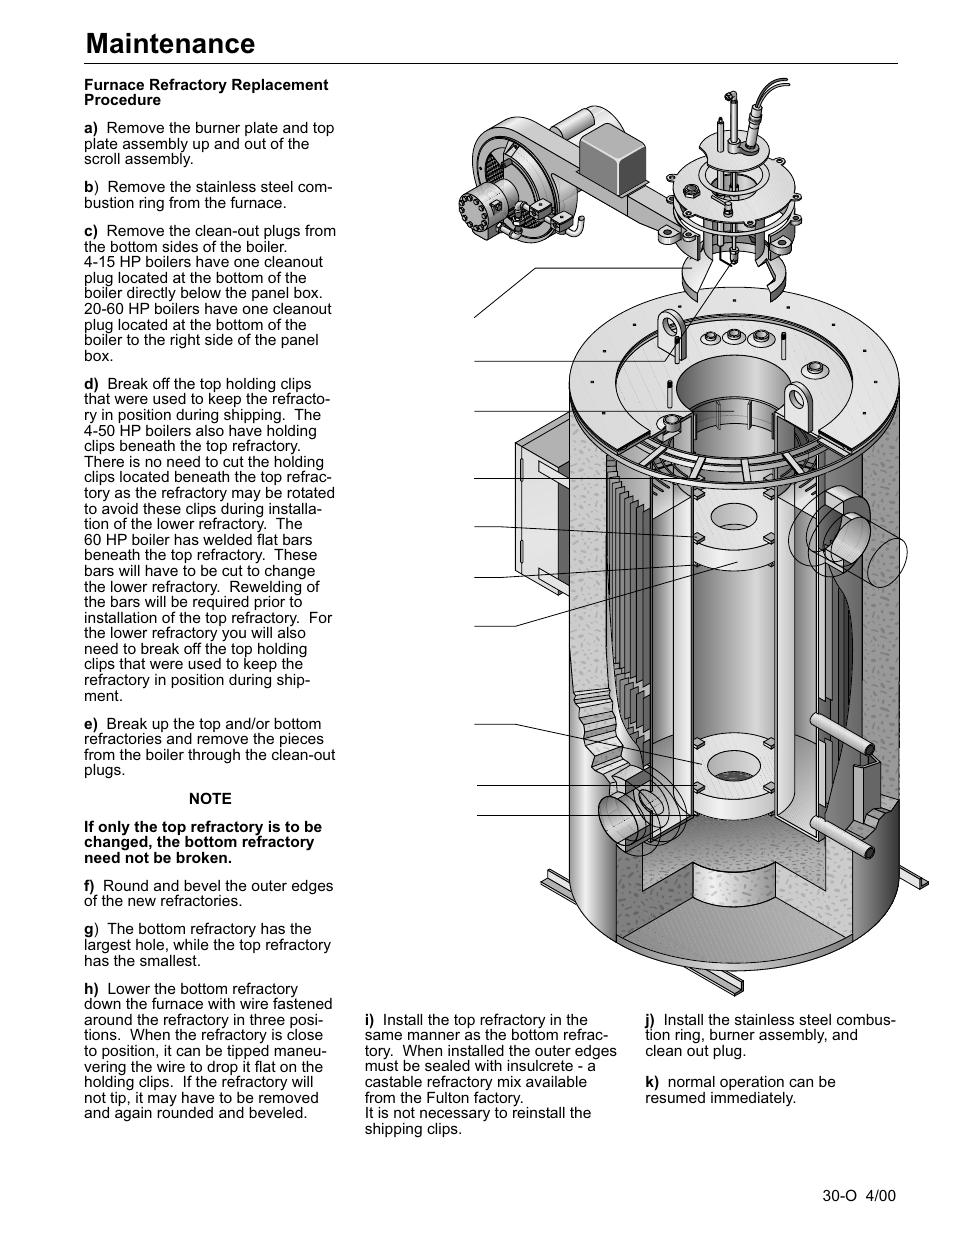 Maintenance Fulton Classic Icx Or Fb F Vertical Tubeless